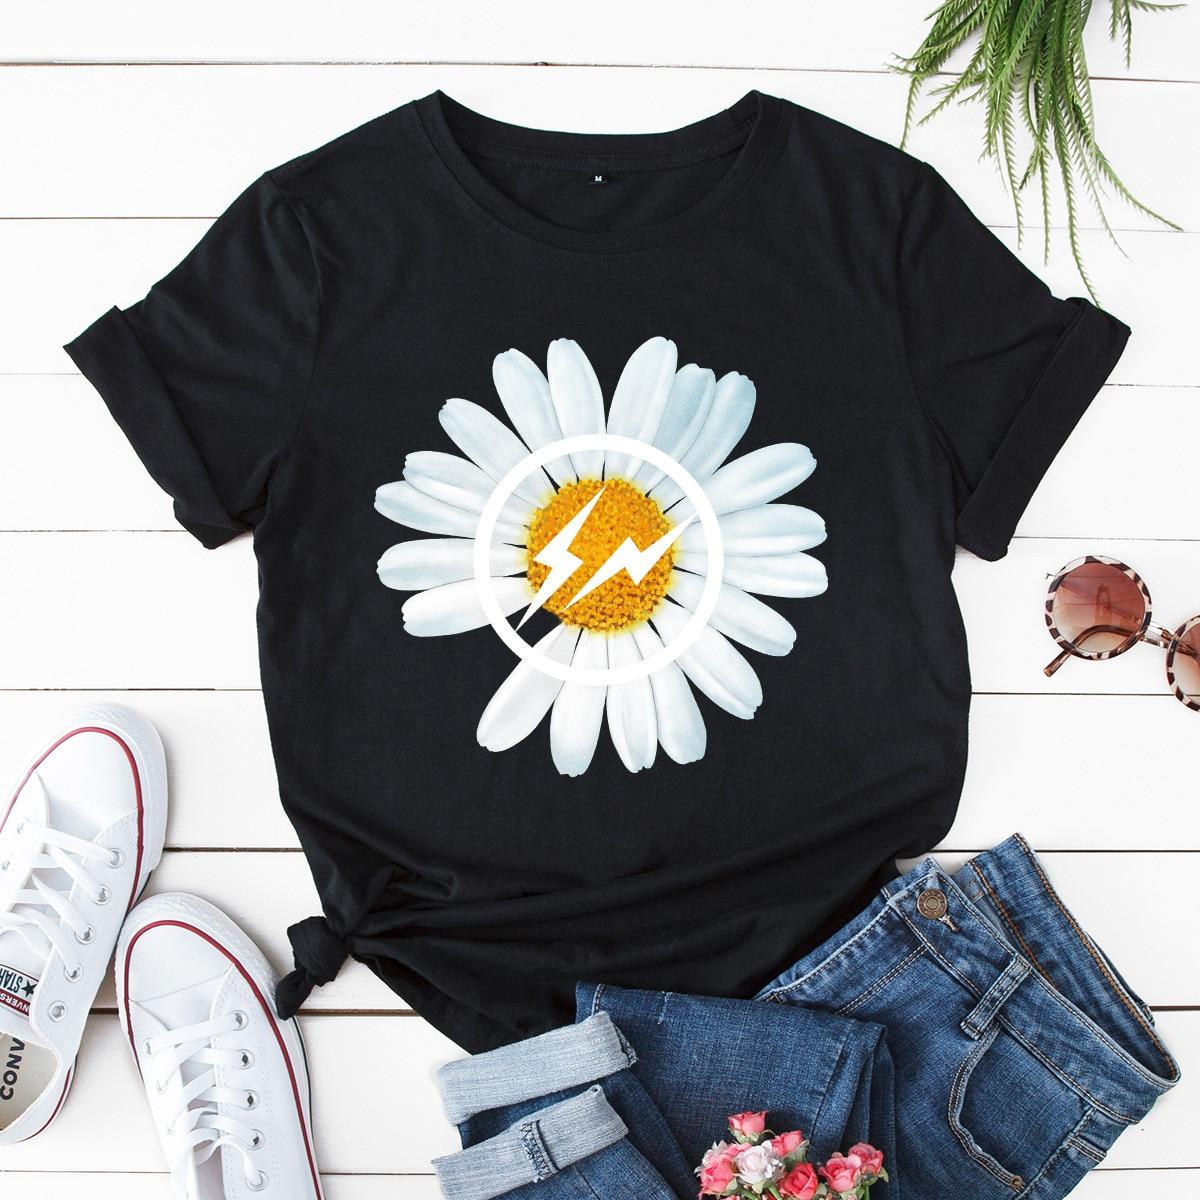 100% Cotton Chrysanthemum Printing Women T-shirt Summer Fashion Tops Large Size Kawaii Print T Shirt Pink New